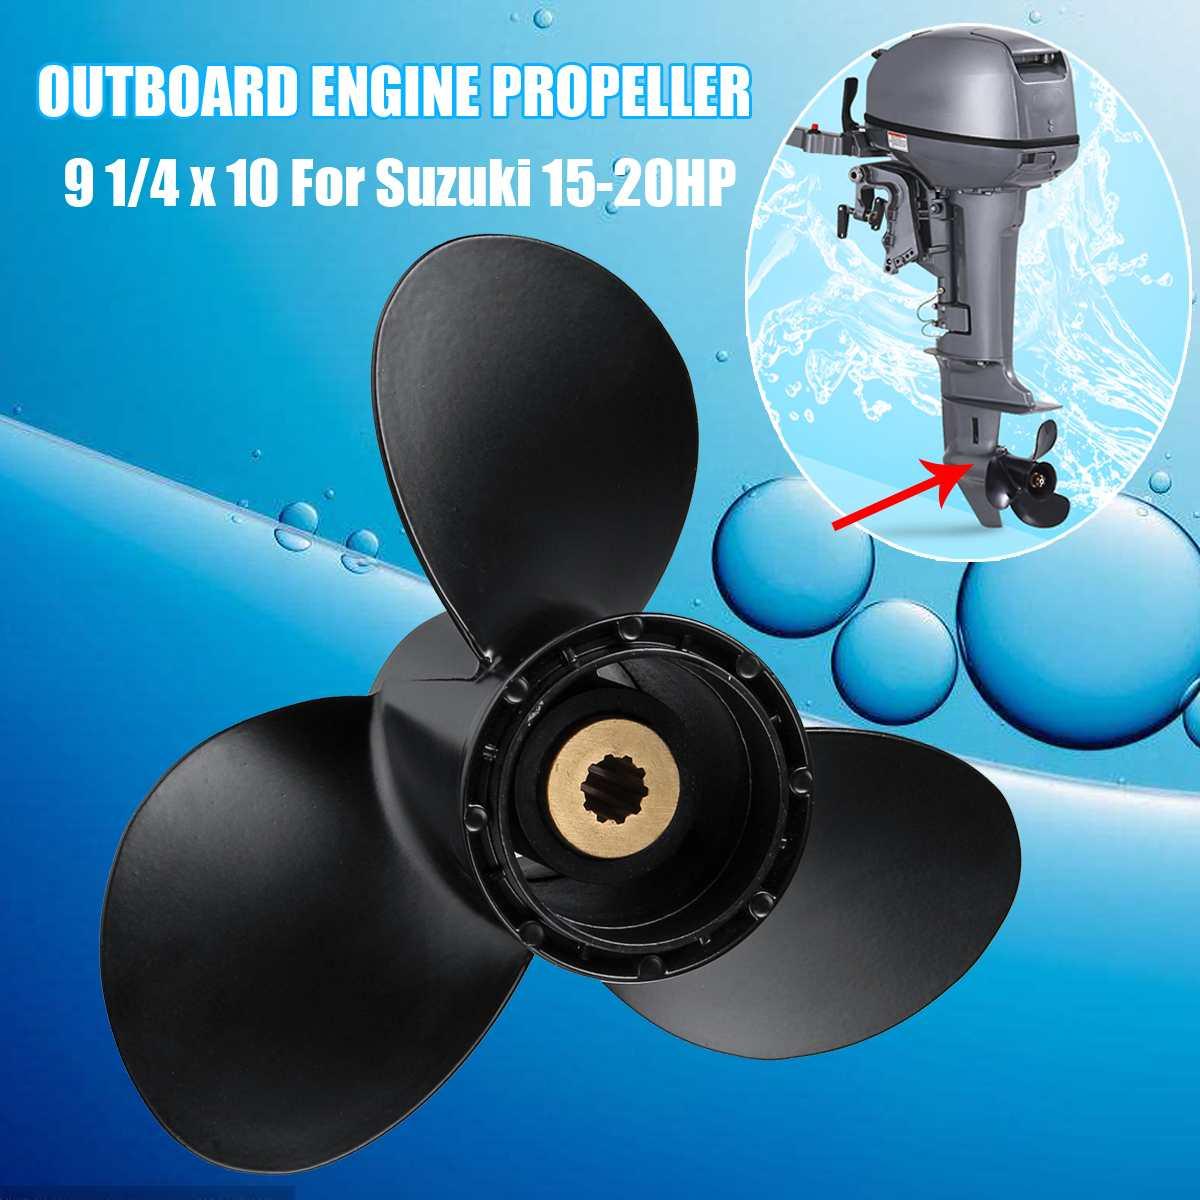 Audew Boat Propeller 58100 93733 019 For Suzuki 15 20HP 9 1 4 x 10 Outboard